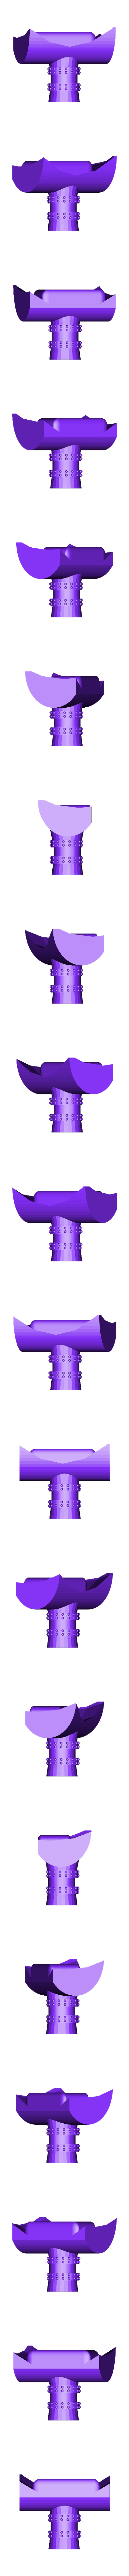 gut_buster_short.stl Télécharger fichier STL gratuit Ork Great Gargant 6mm Epic Scale Proxy model • Objet à imprimer en 3D, redstarkits